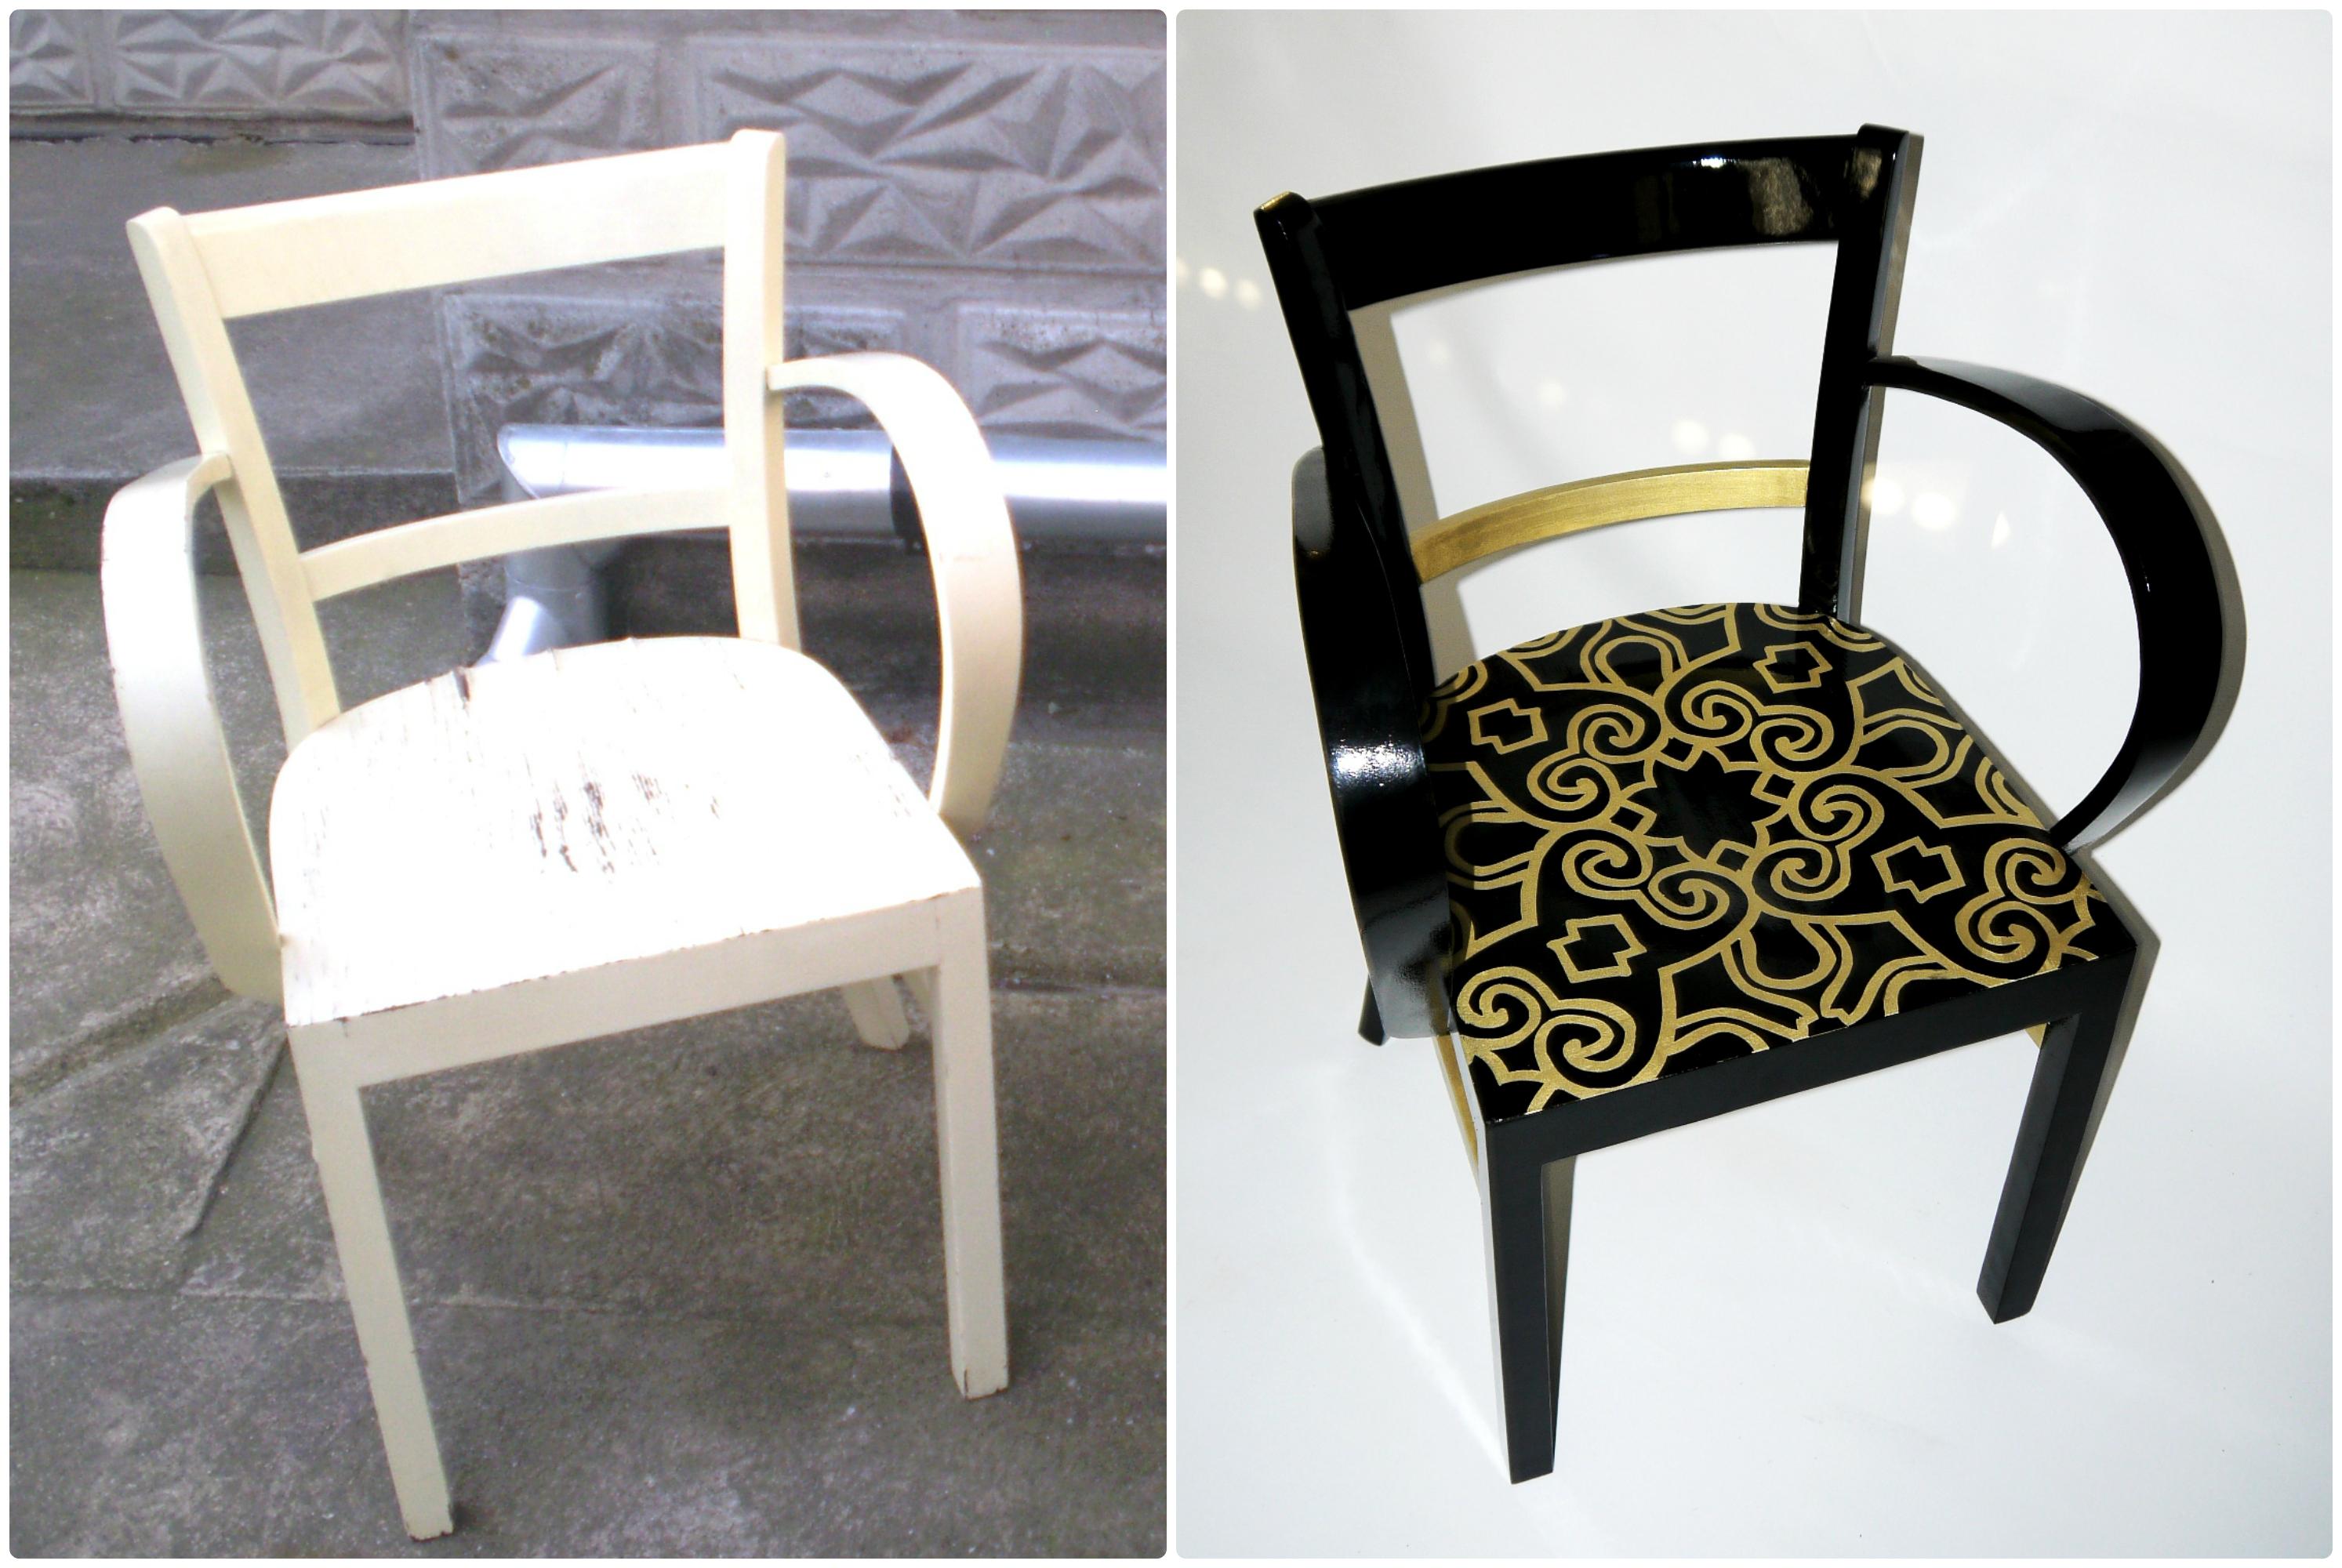 Előtte-utána / Before-after